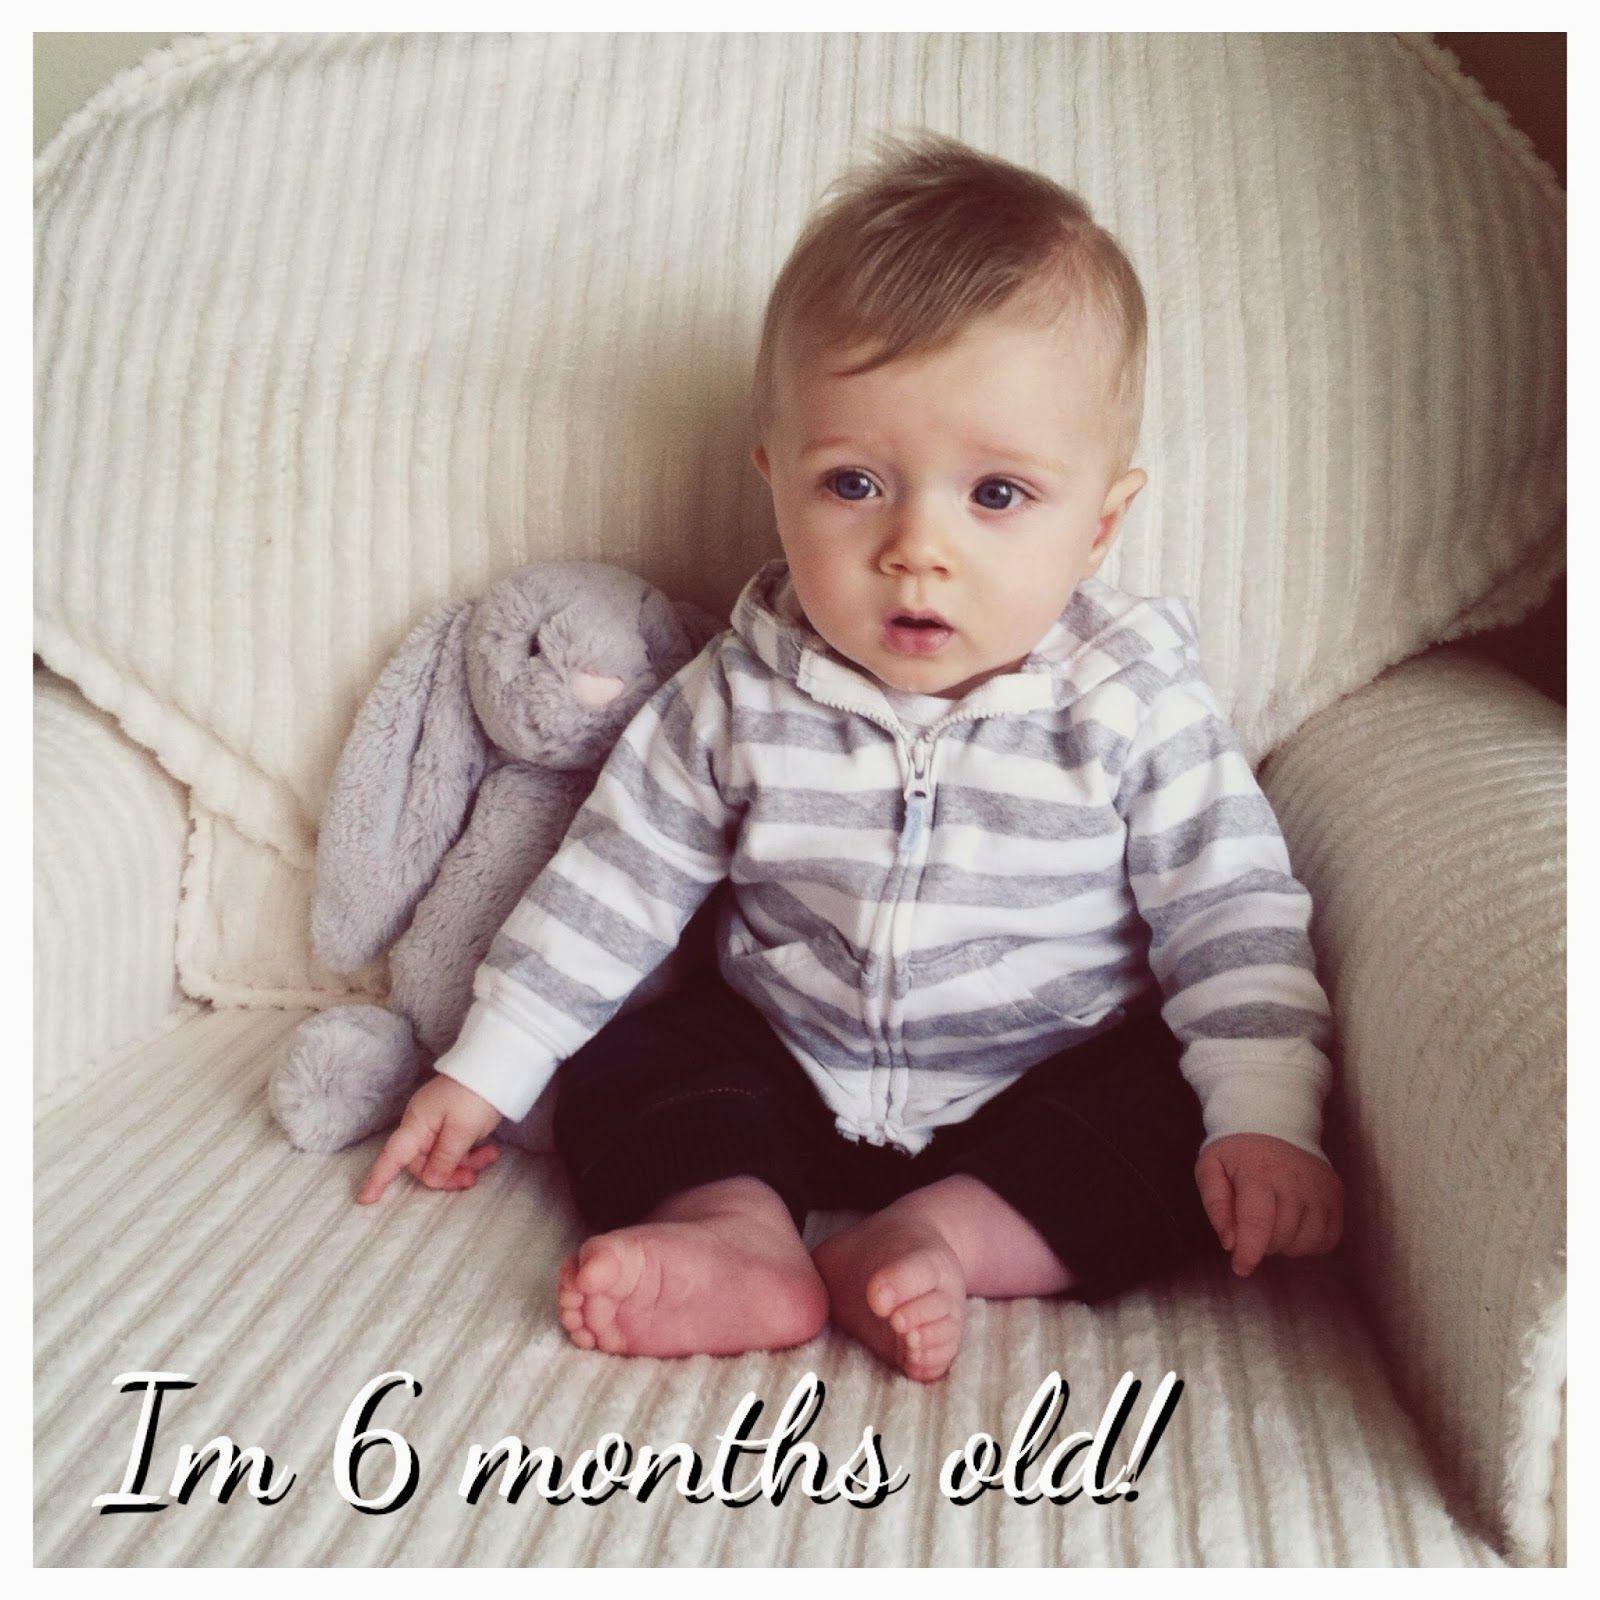 6 Month Old Photo Half Birthday Photo Mom Blogger Baby